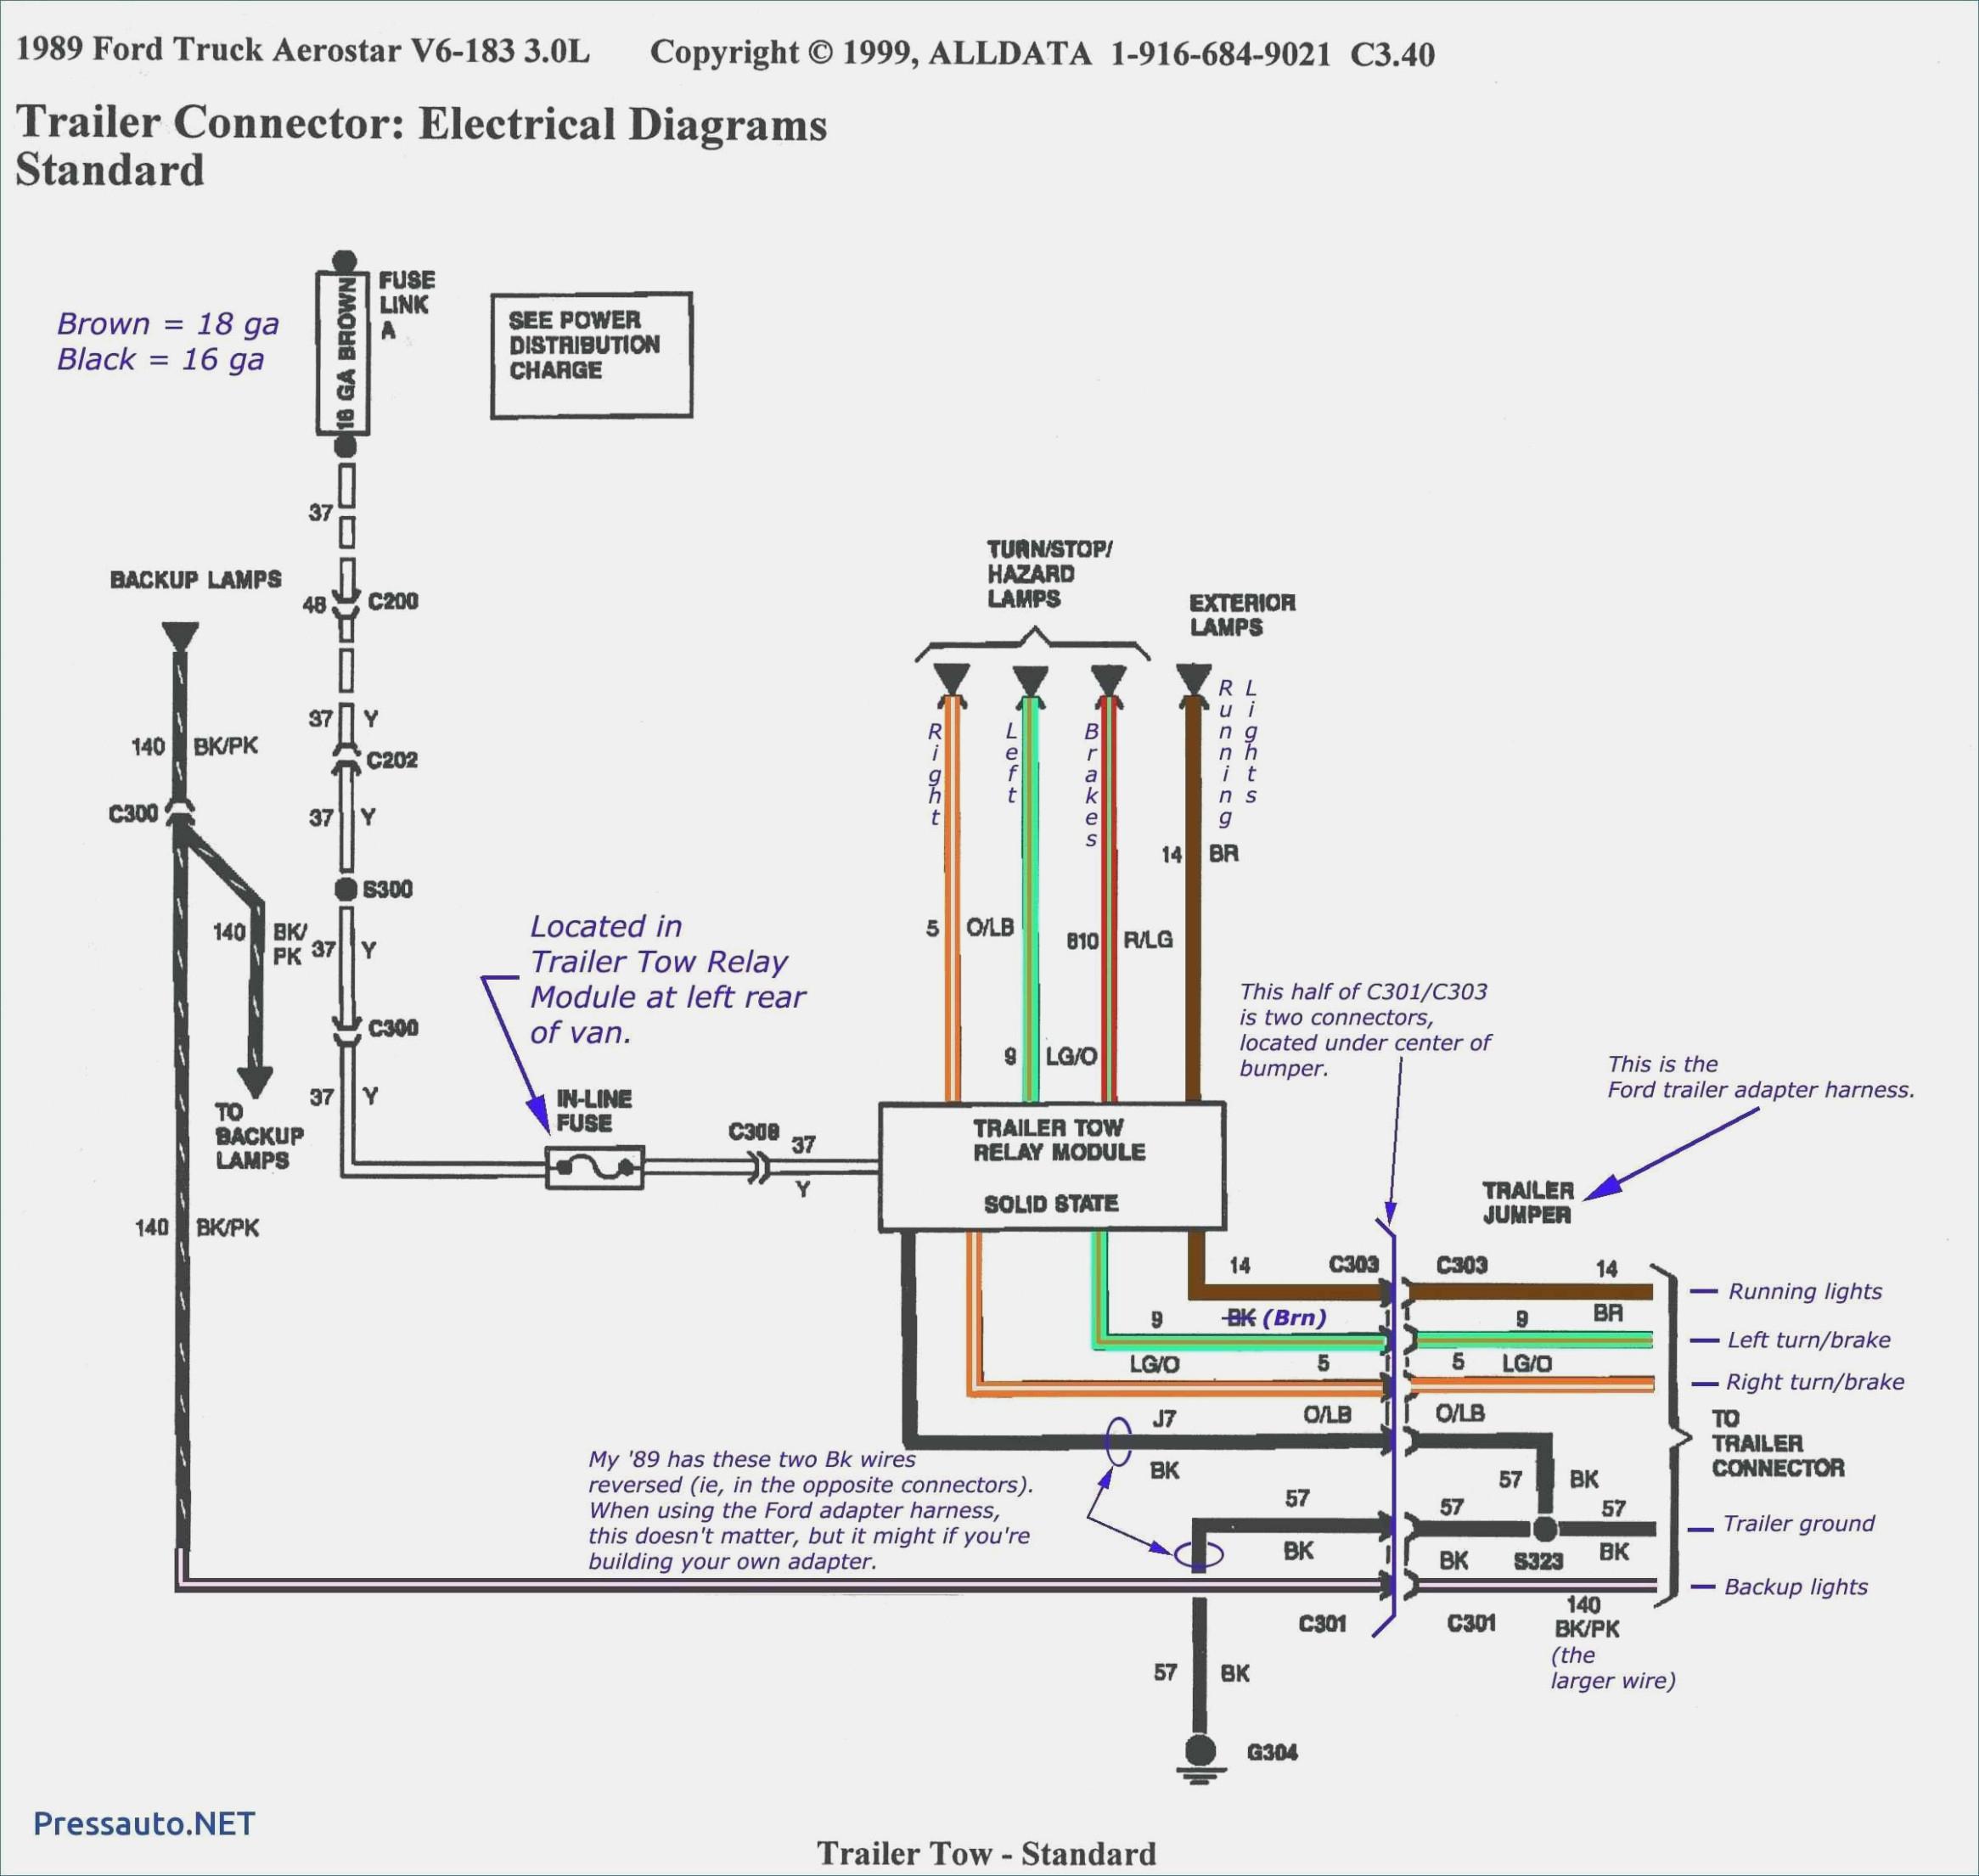 5Th Wheel Wire Diagram | Wiring Diagram - Semi Trailer Wiring Diagram